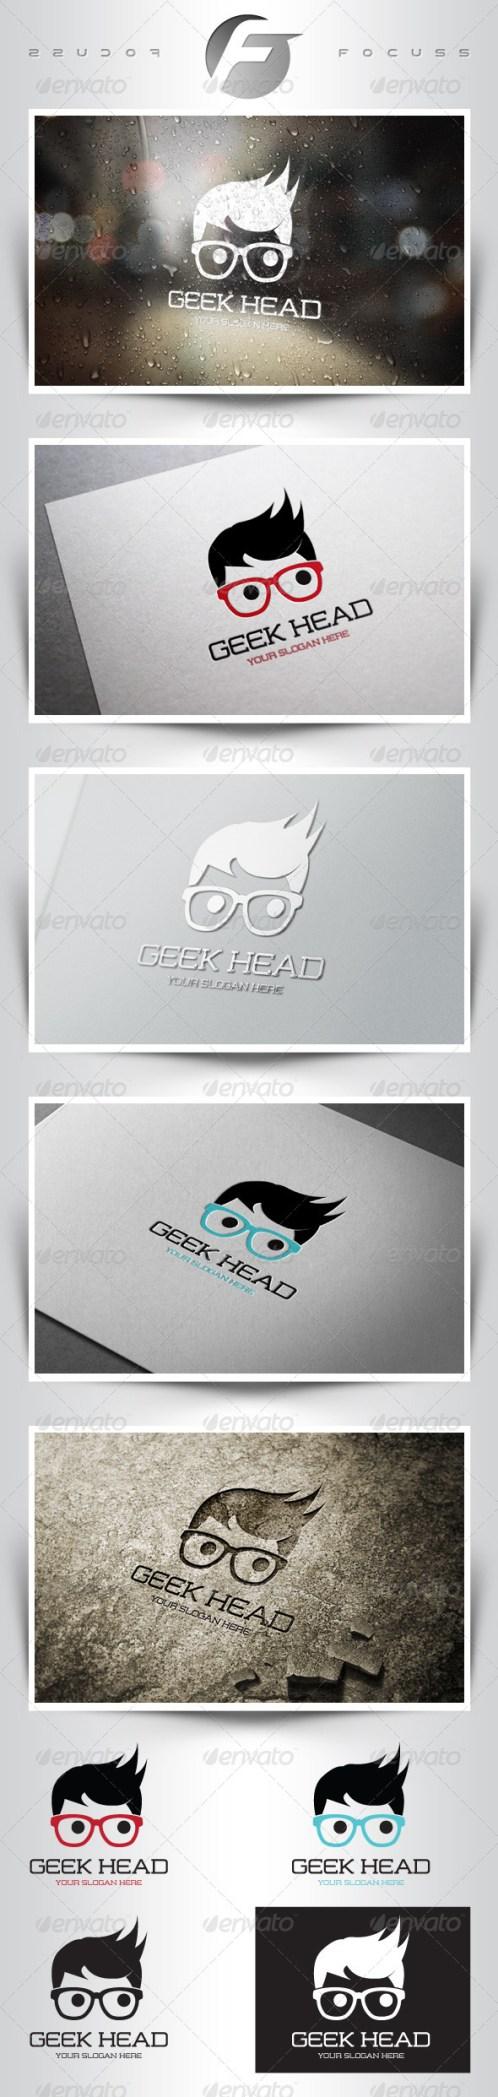 Logotipos para Ópticas fashion.